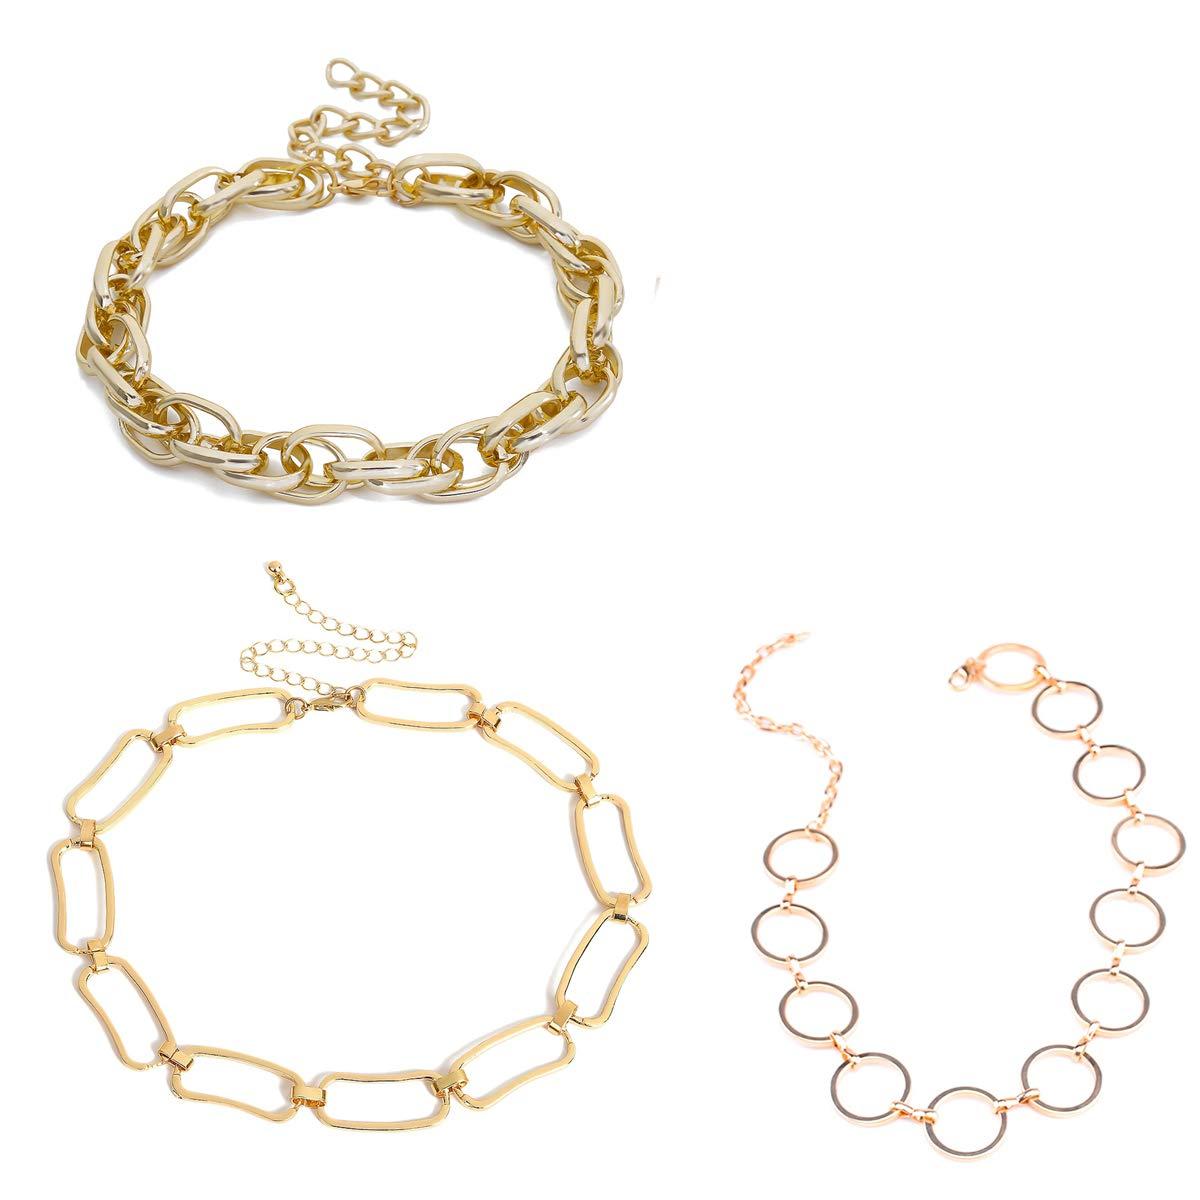 AnVei  - ナオゴールドチェーンネックレスネックレス女性の夏の3ピースパンク粗いシルバーのネックレス